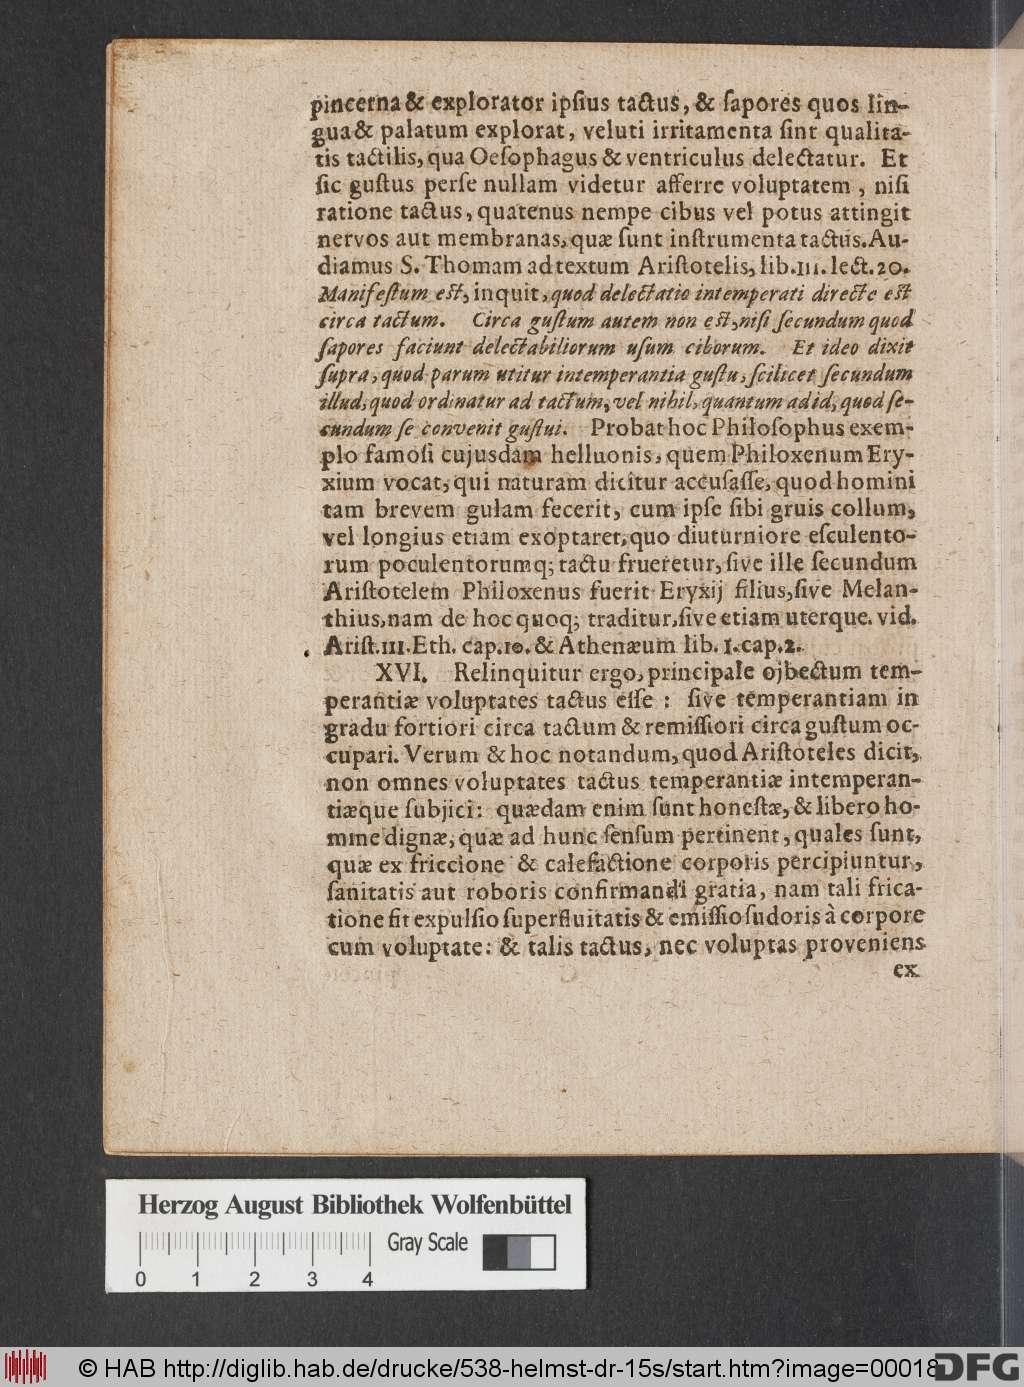 https://diglib.hab.de/drucke/538-helmst-dr-15s/00018.jpg